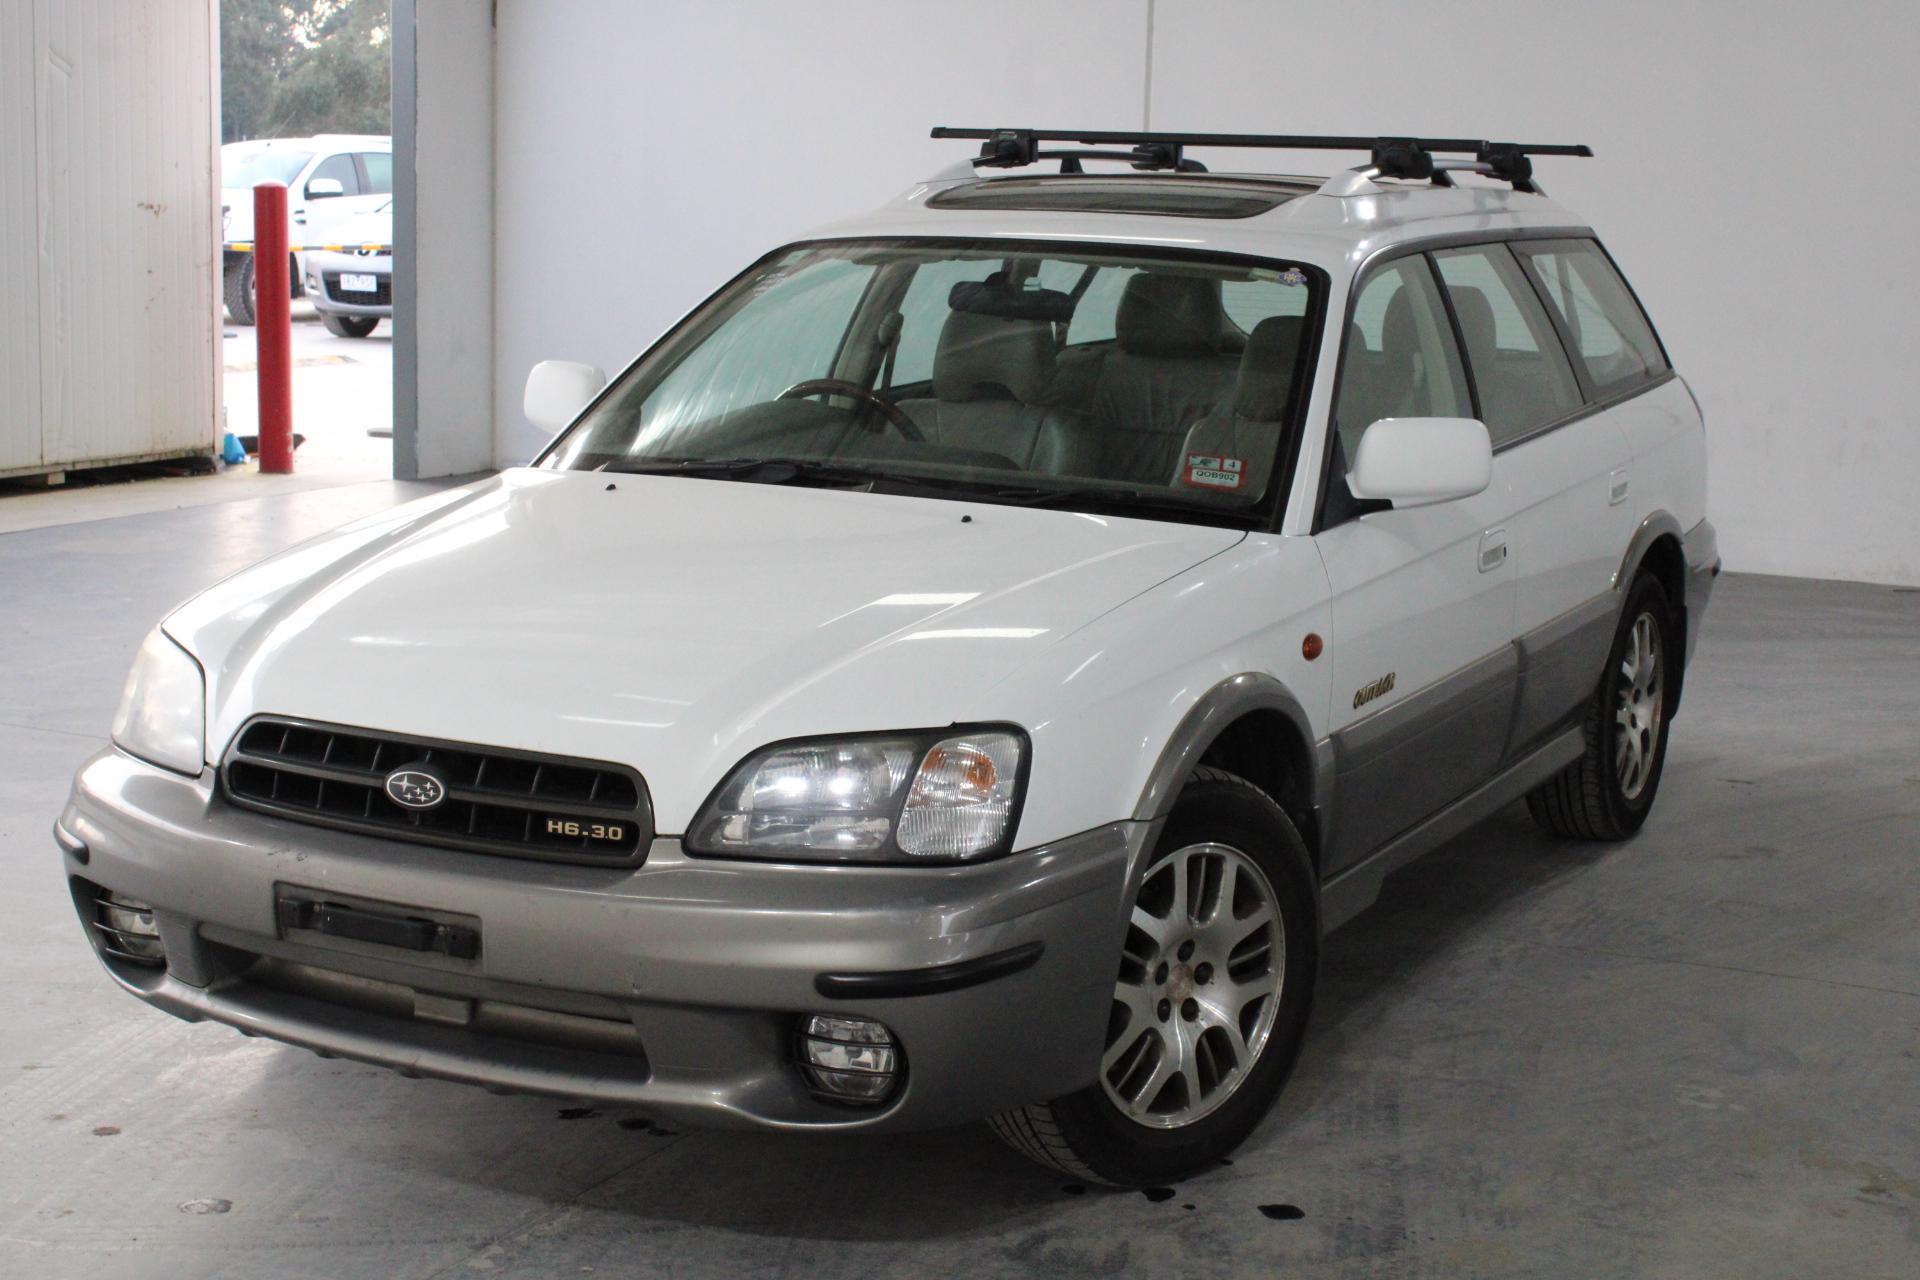 2001 Subaru Outback H6 B3A Automatic Wagon